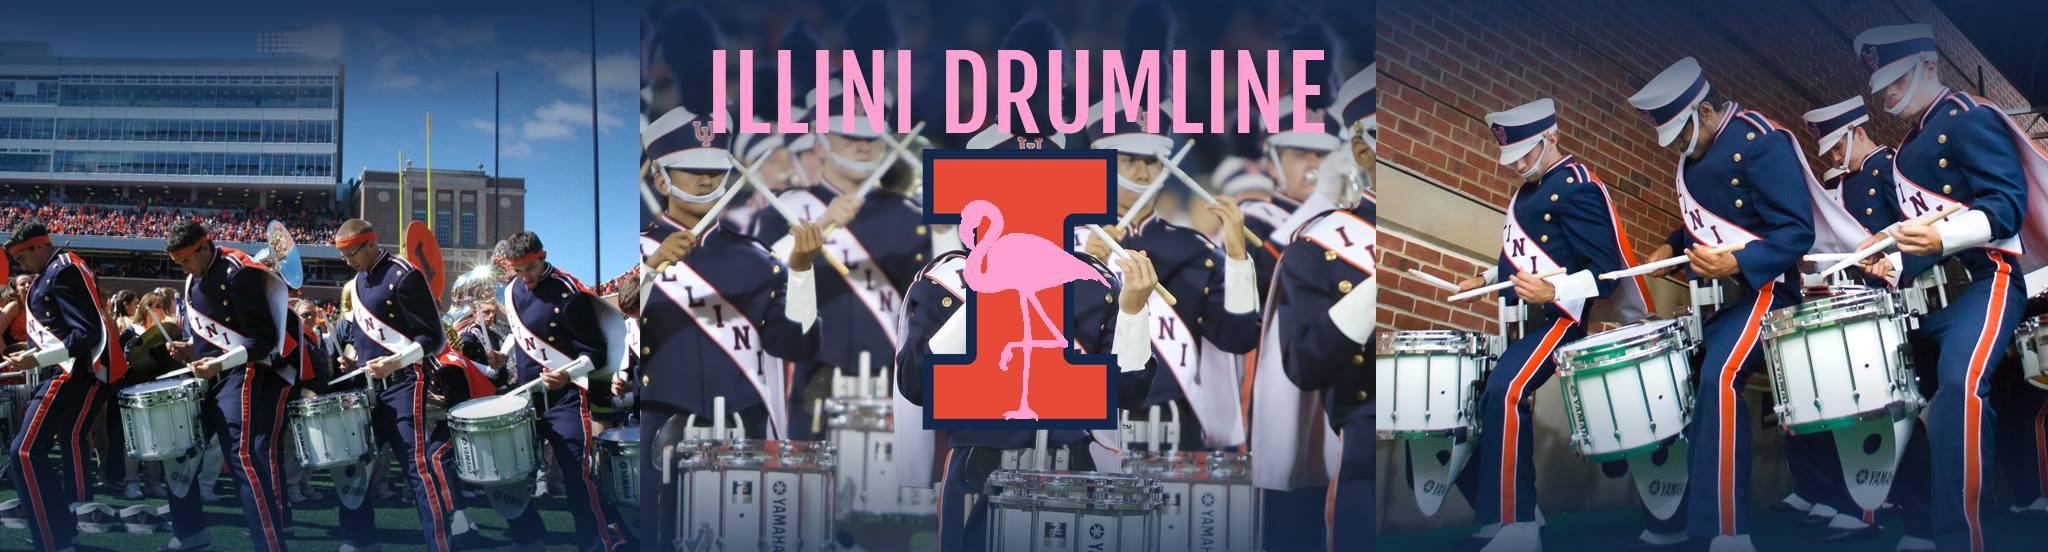 Illini Drumline